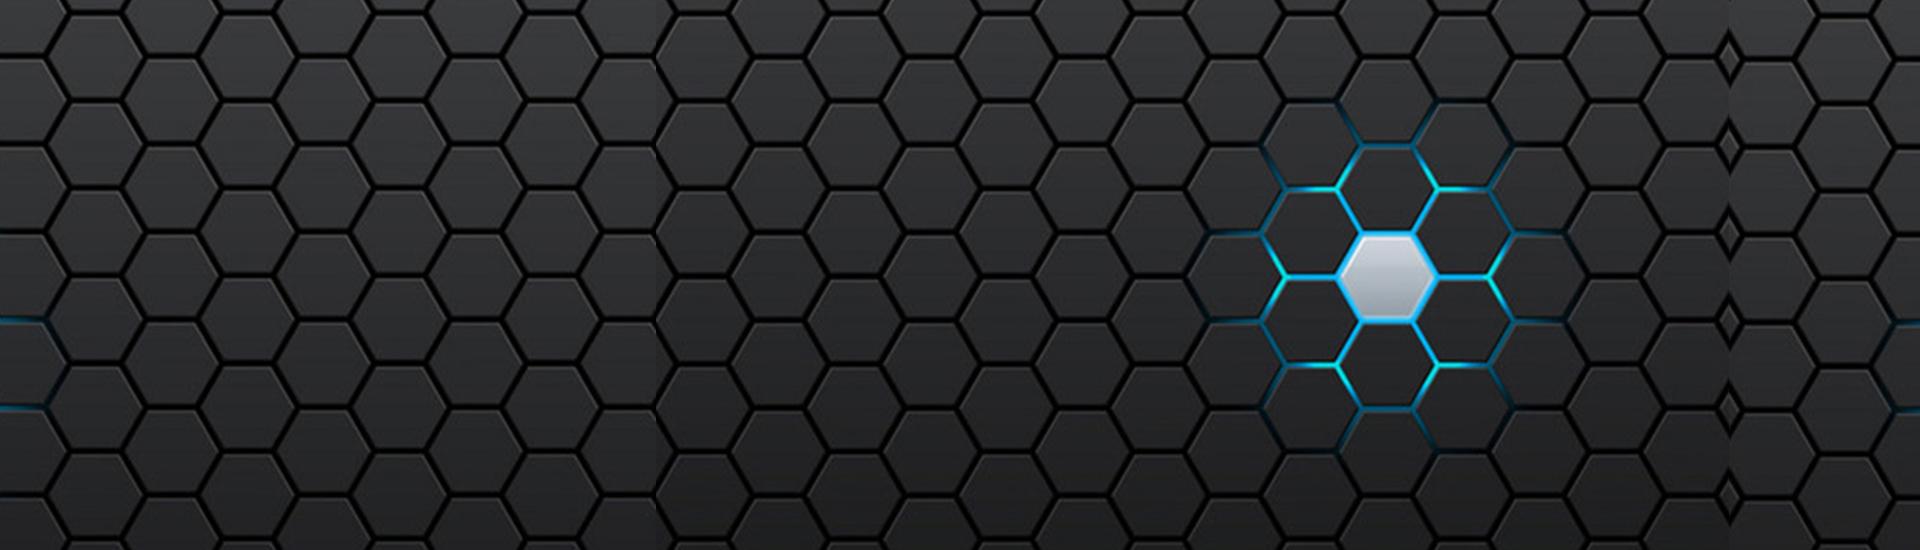 effet de lumi u00e8re de fond noir un rectangle bleu affiche